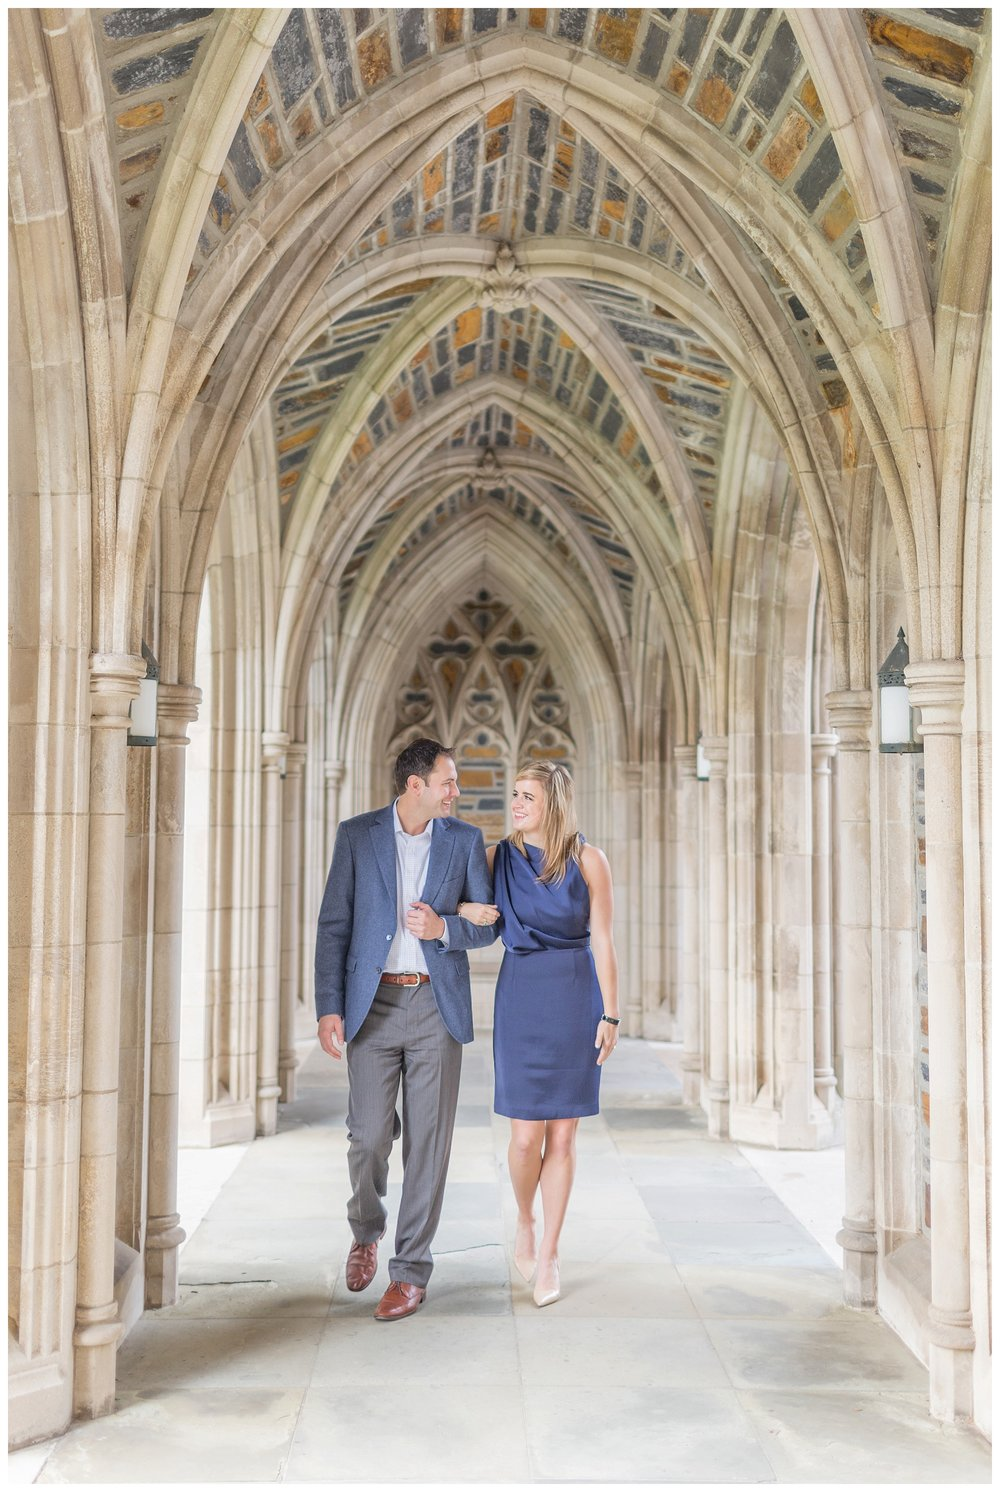 duke-university-engagement-durham-wedding-photographer_0005.jpg